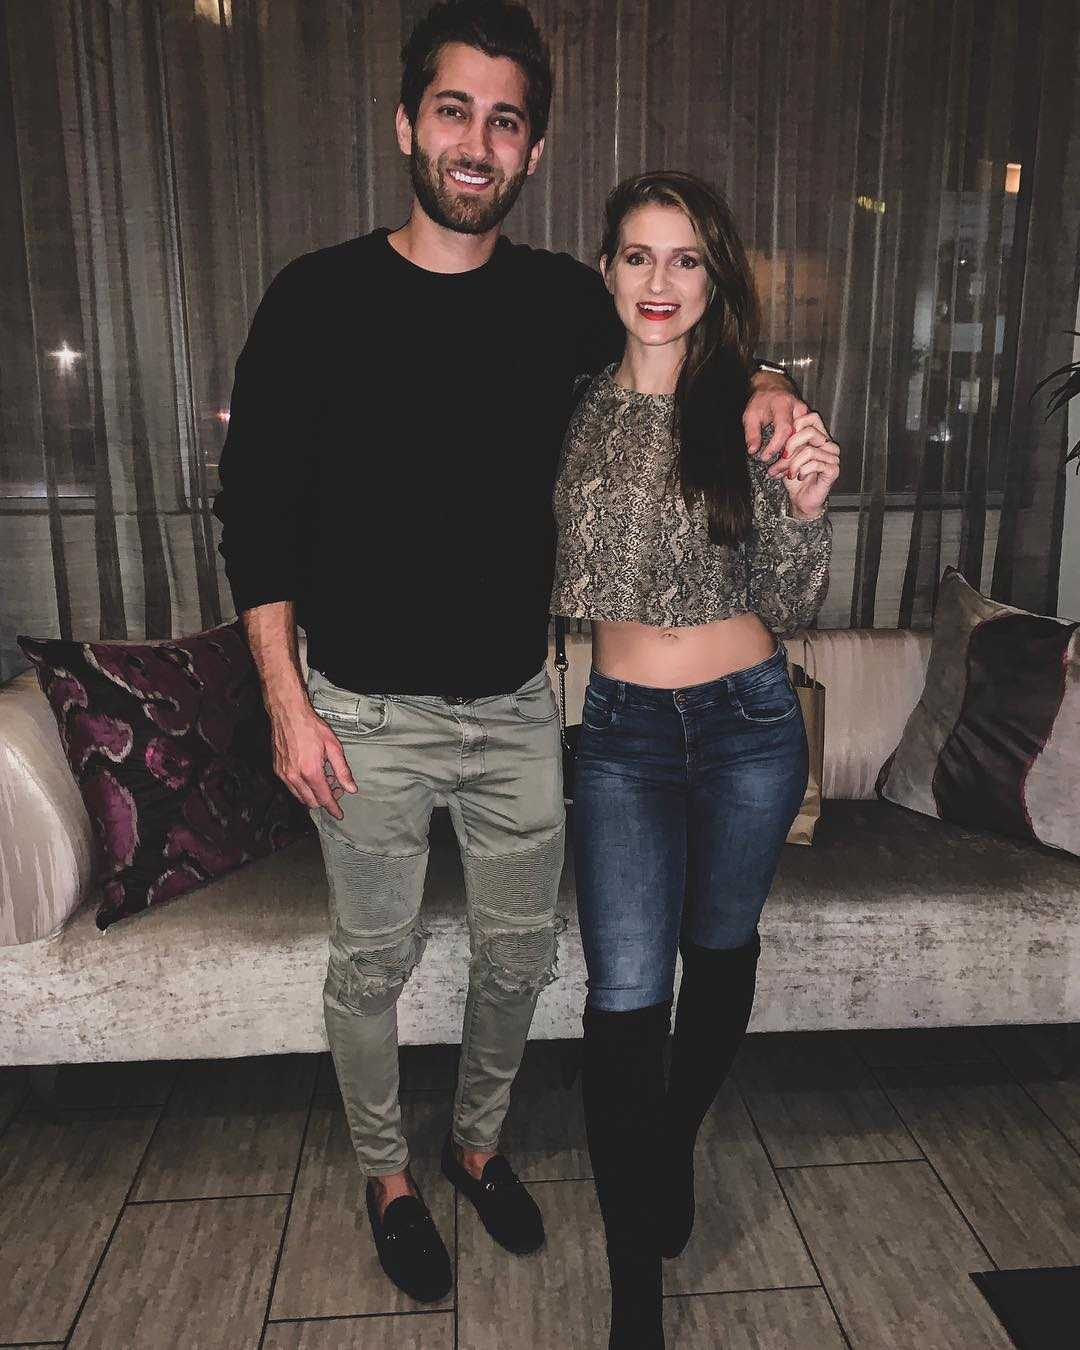 Jared Black and Rebecca Broxterman